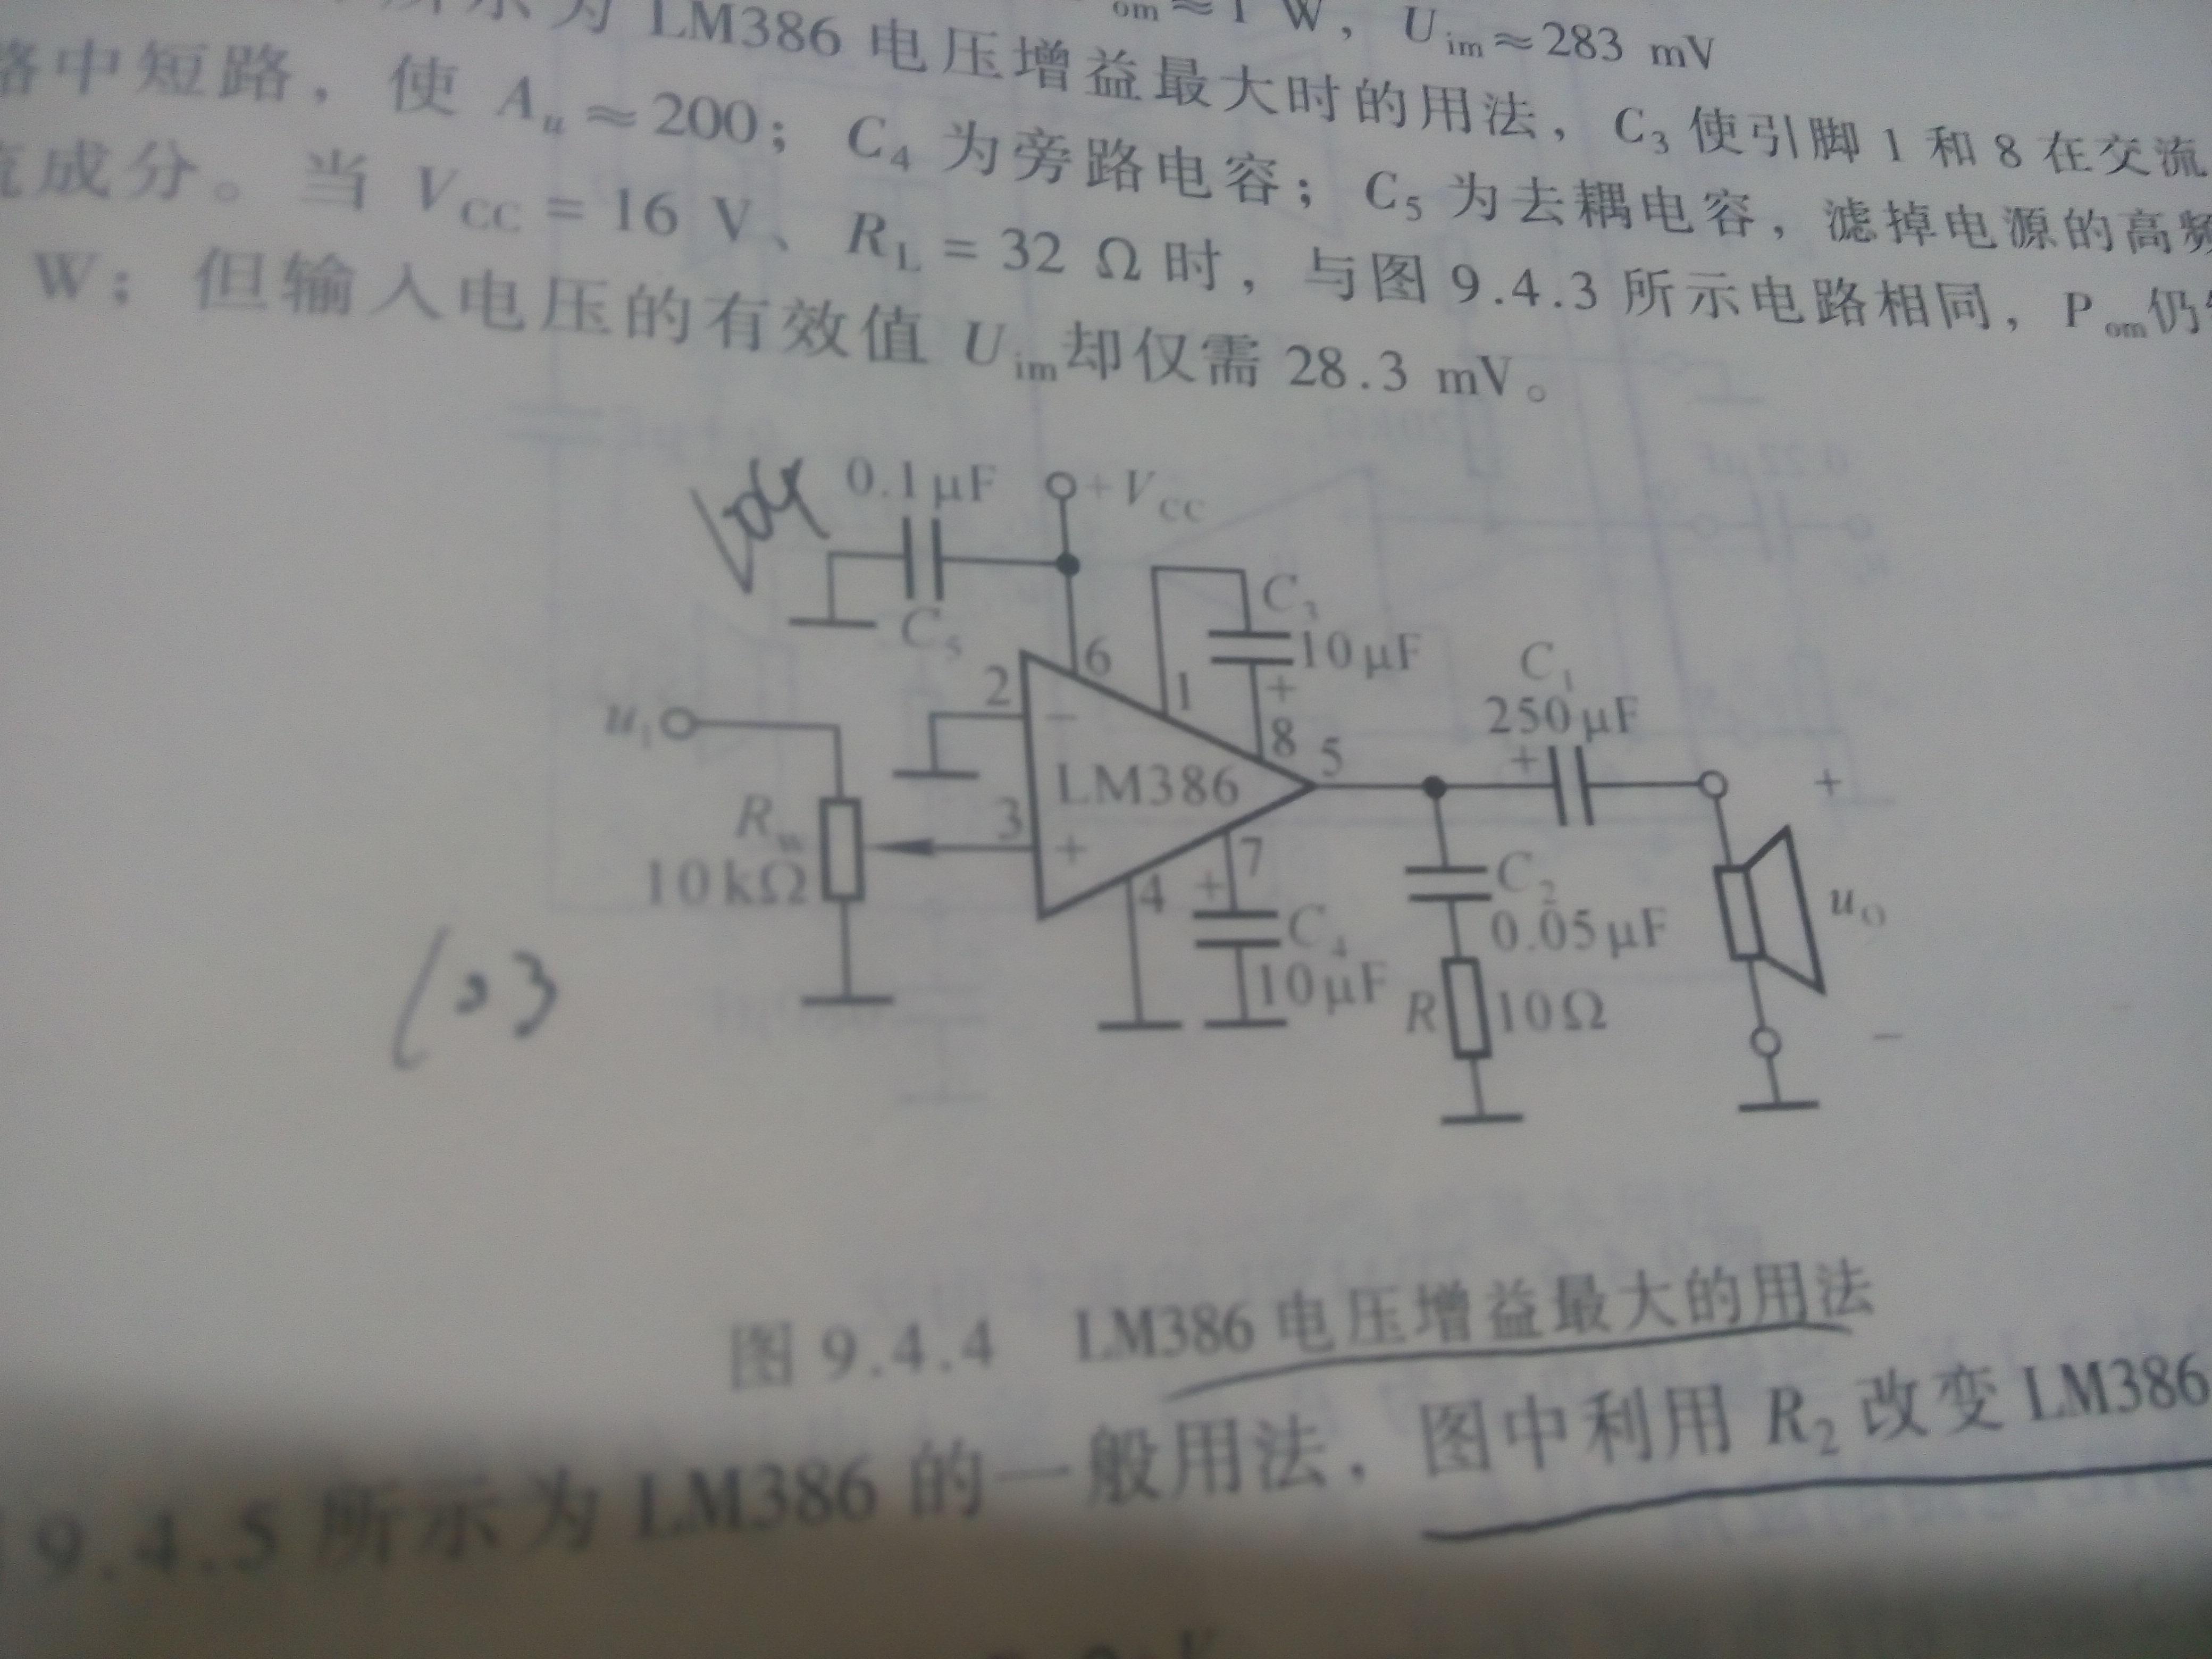 LM386功放电路